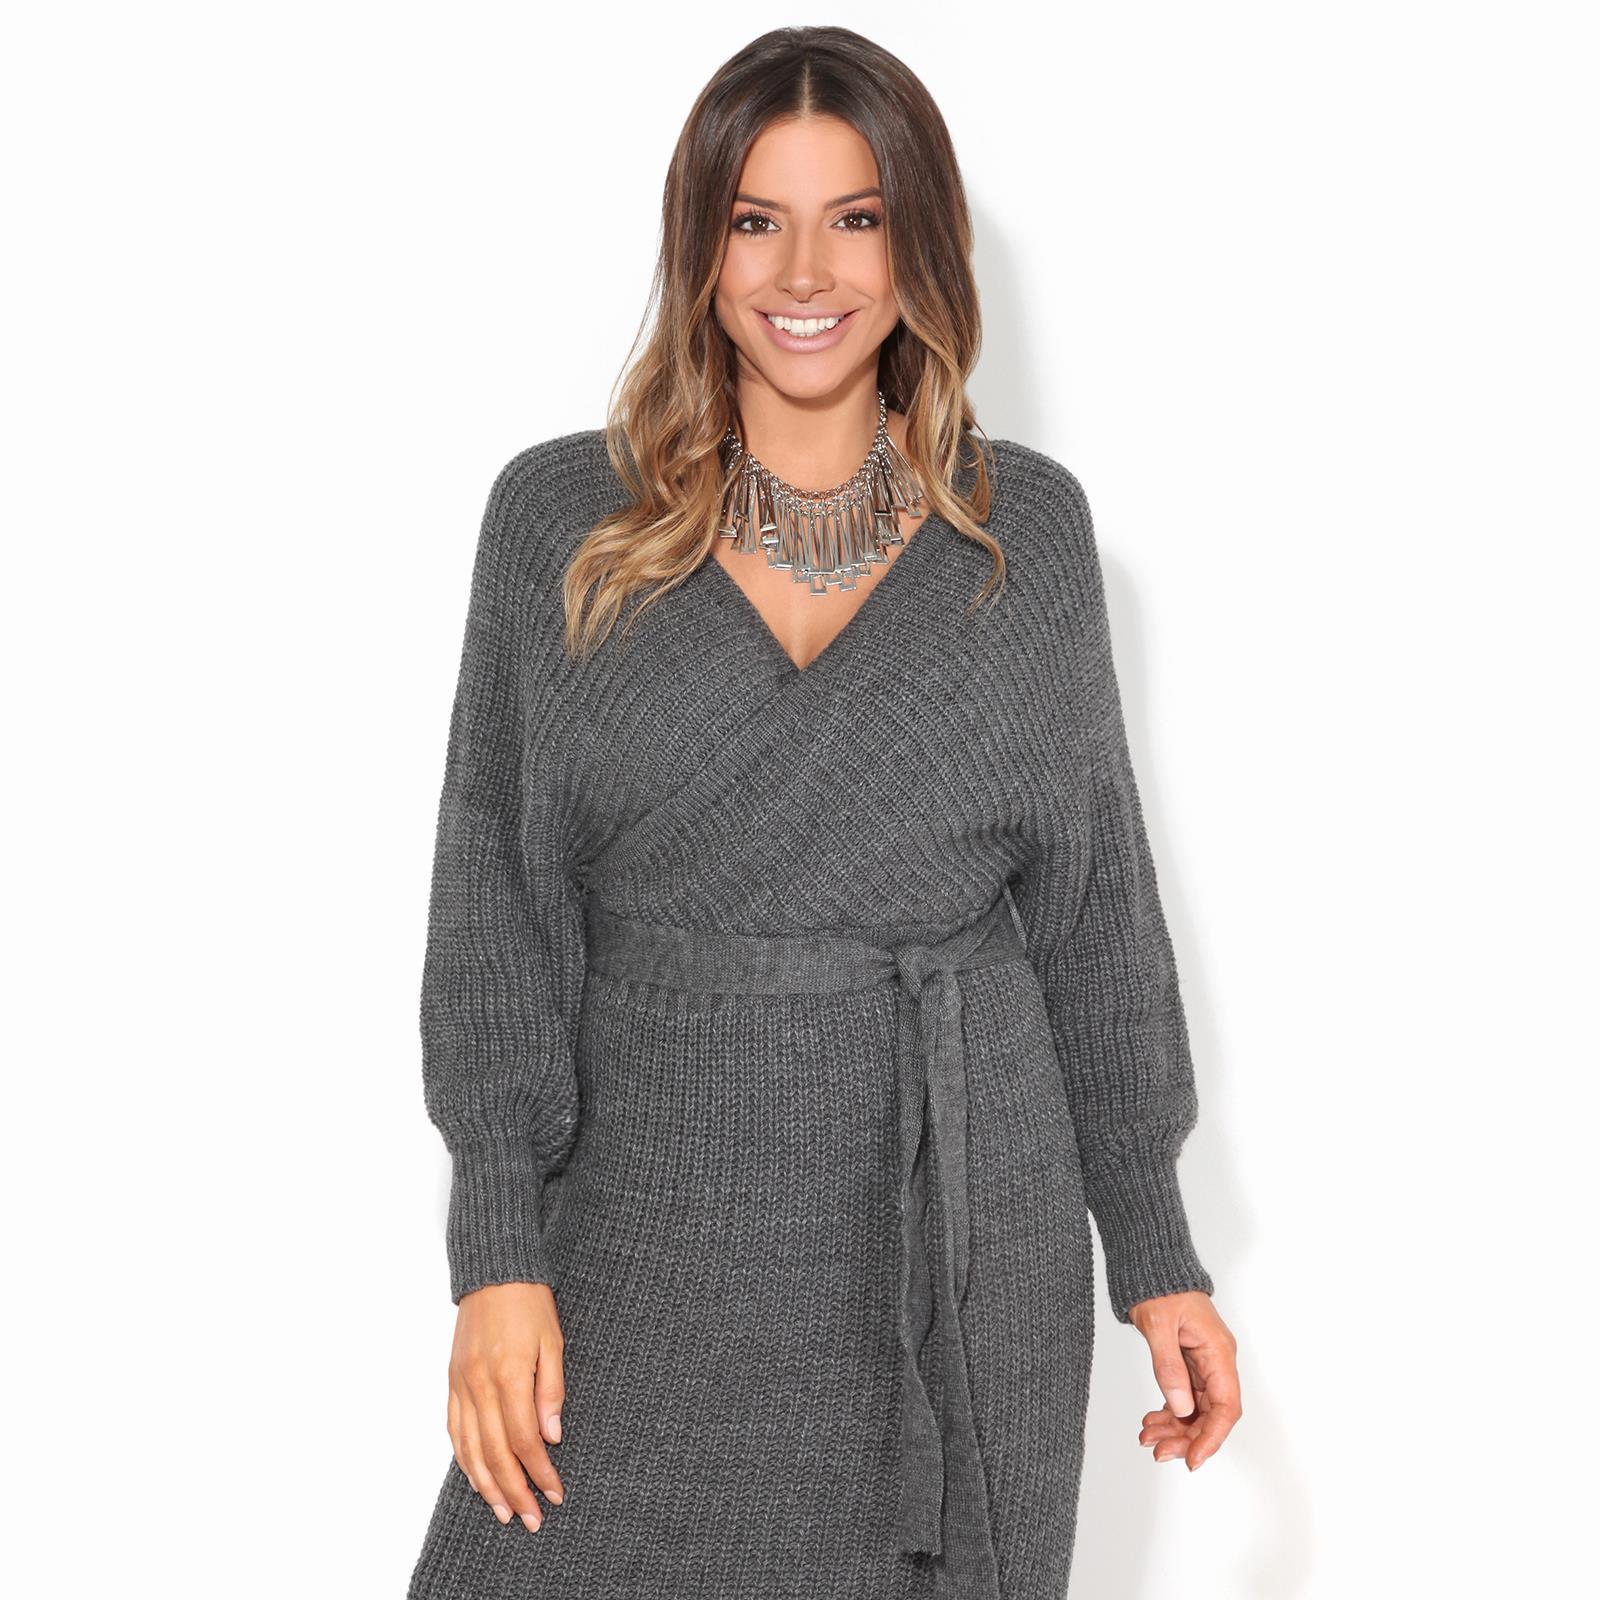 Womens-Ladies-Jumper-Dress-Chunky-Knit-Wrap-V-Neck-Maxi-Long-Sleeve-Winter-Top thumbnail 6